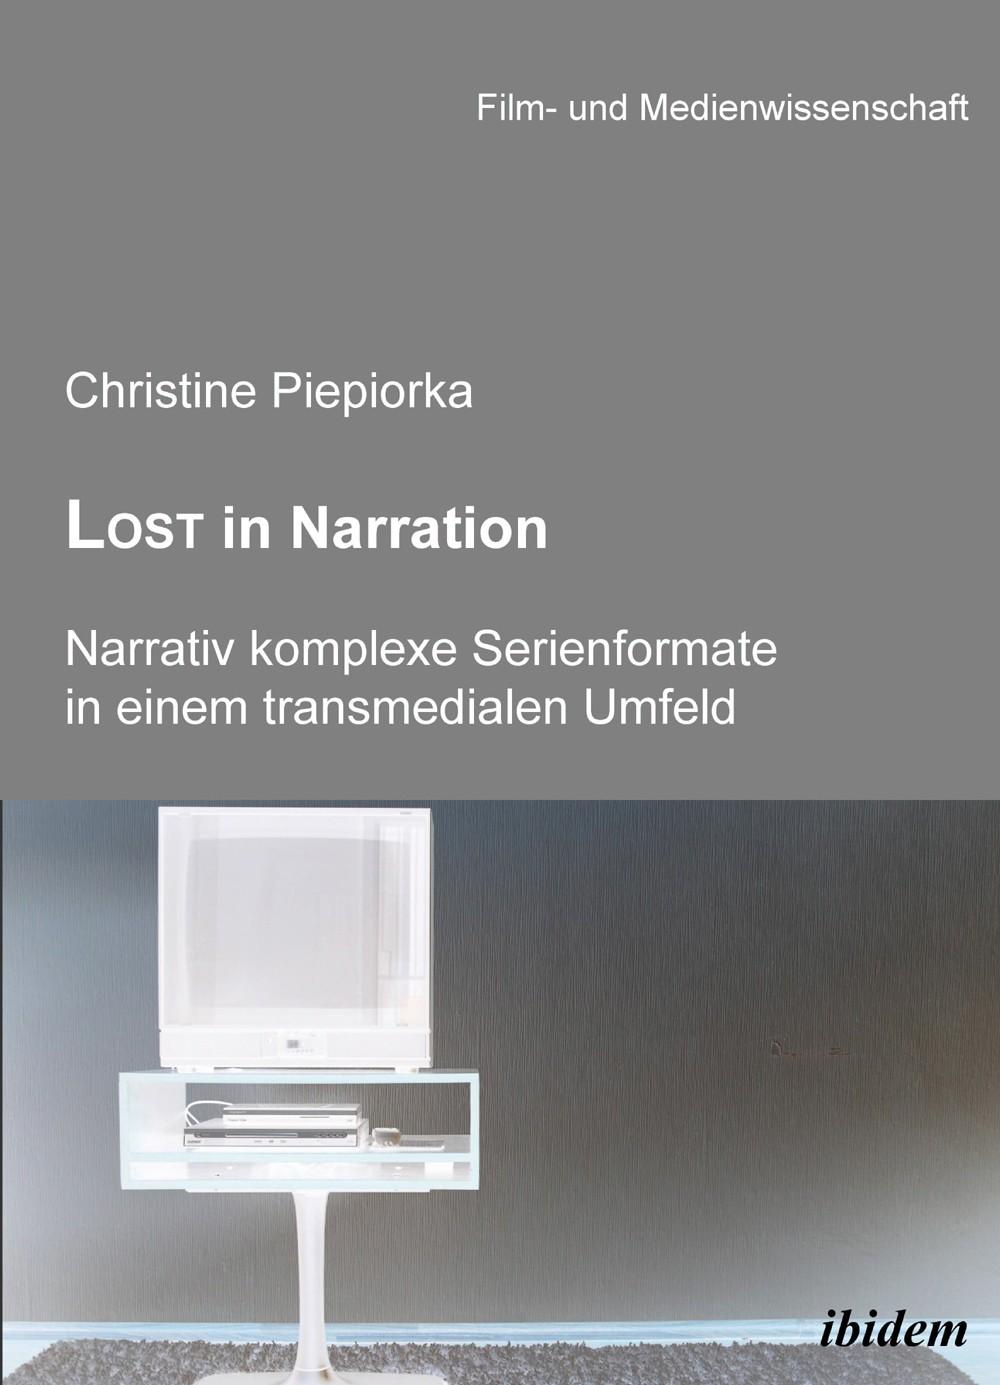 Lost in Narration. Narrativ komplexe Serienformate in einem transmedialen Umfeld